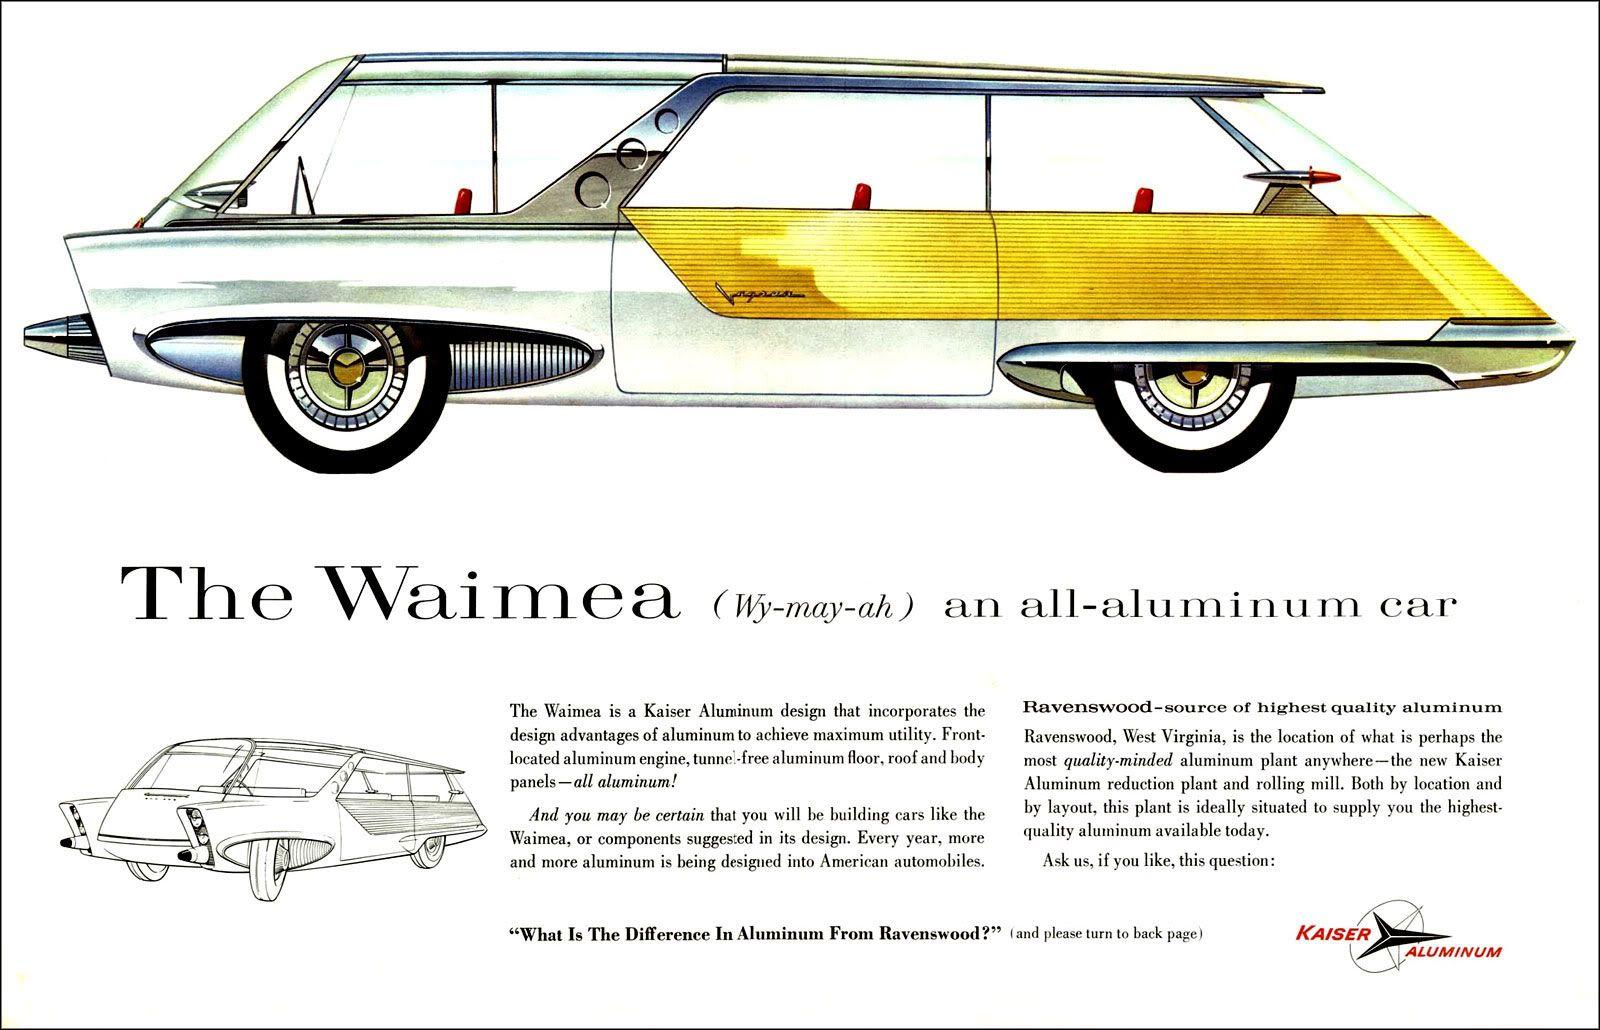 Kaiser Aluminum The Coolest Cars Ever Detroit Forgot To Build